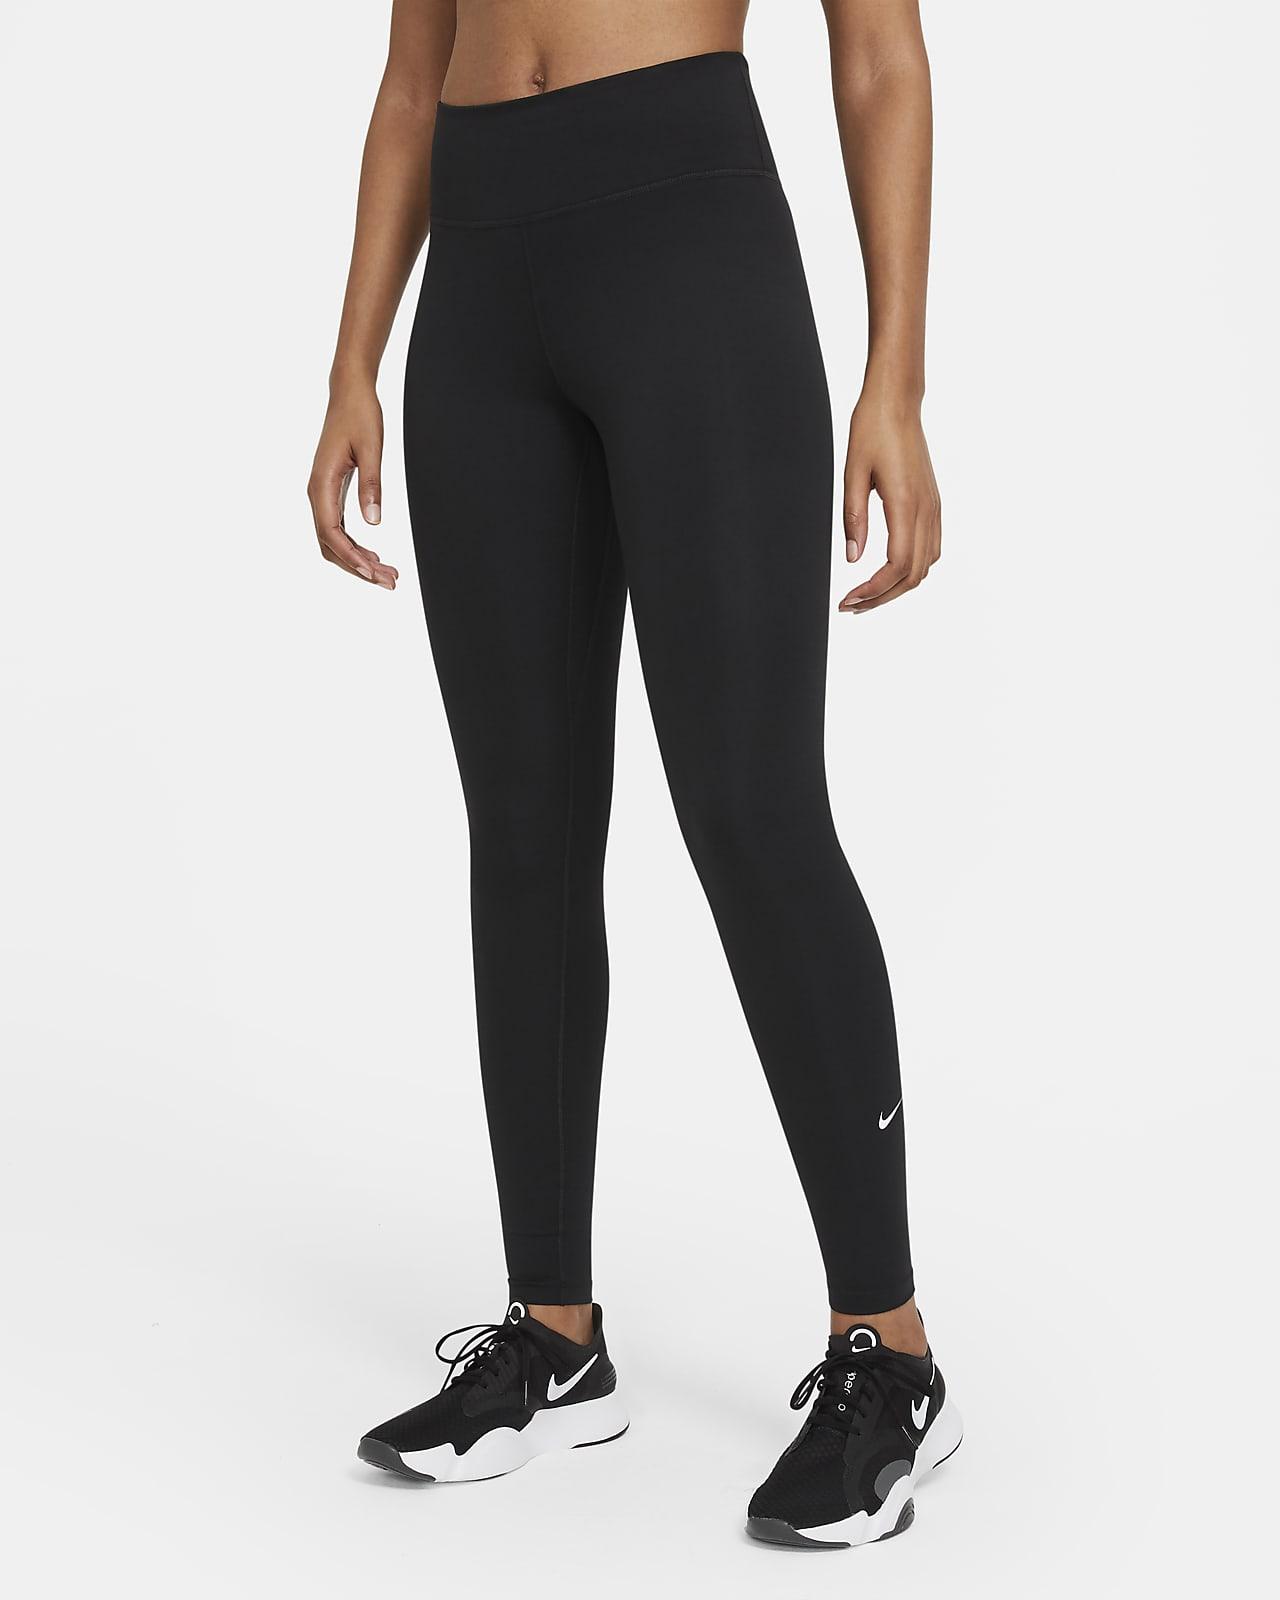 Nike Dri-FIT One-leggings med mellemhøj talje til kvinder